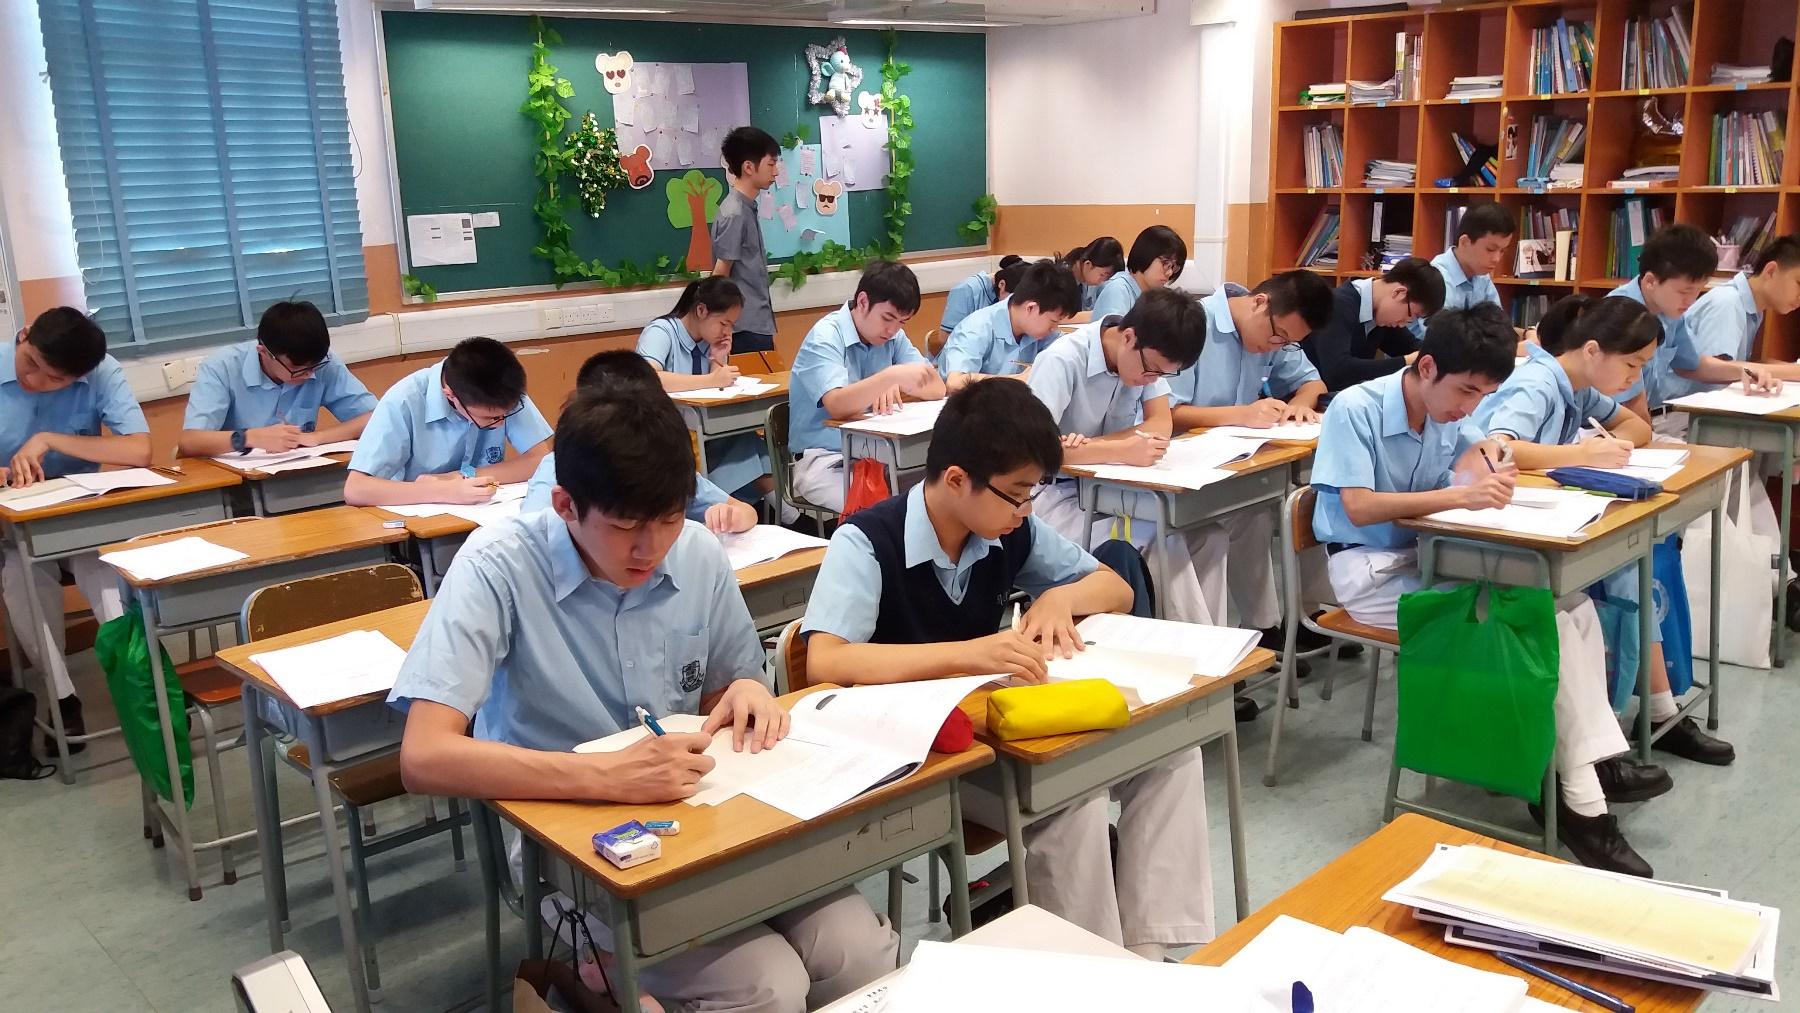 http://npc.edu.hk/sites/default/files/20181006_102057.jpg